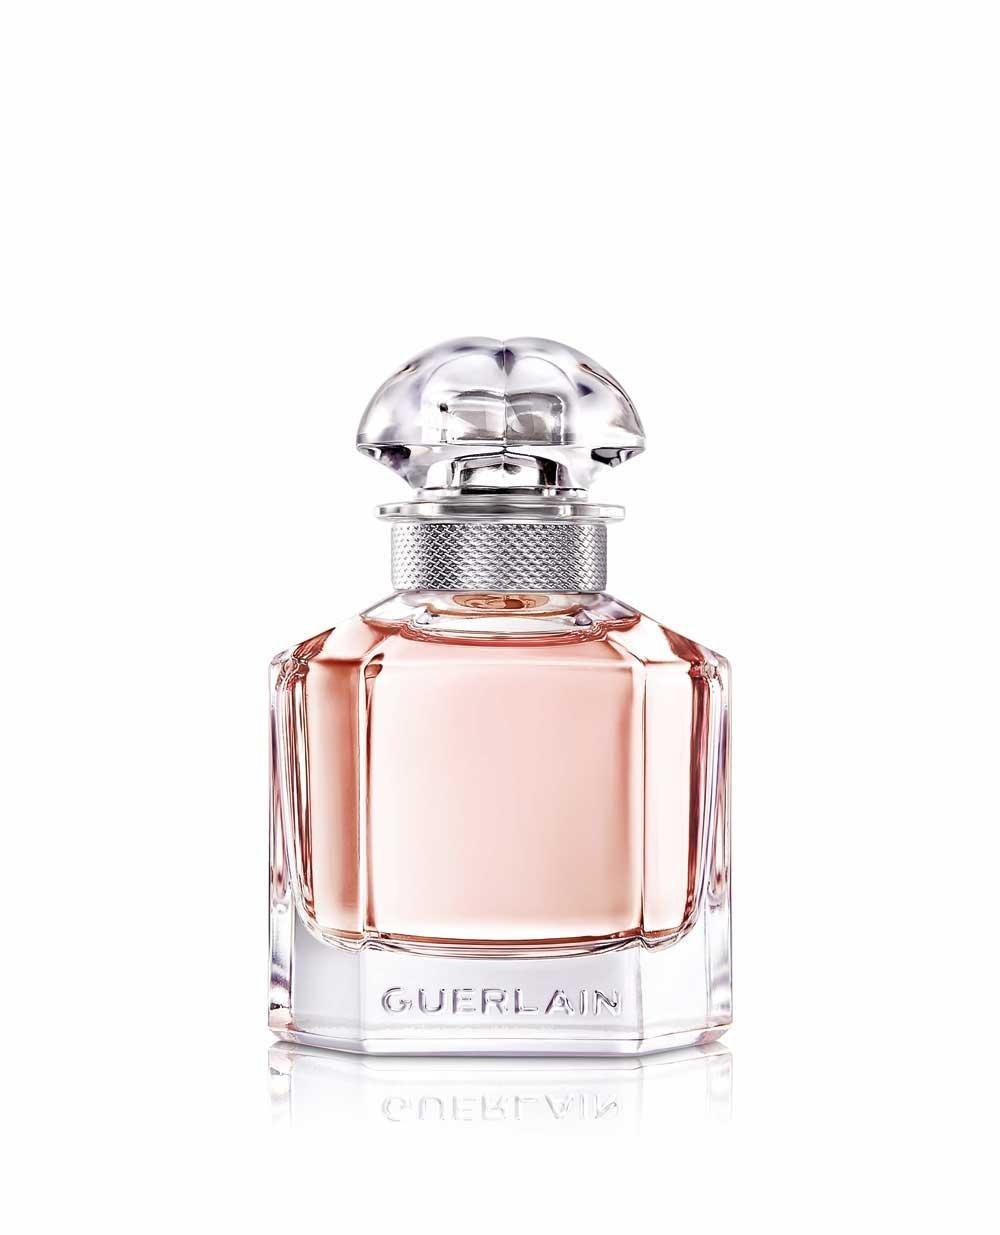 غيرلان تطلق عطر Mon Guerlain Bloom of Rose Eau de Parfum الجديد: